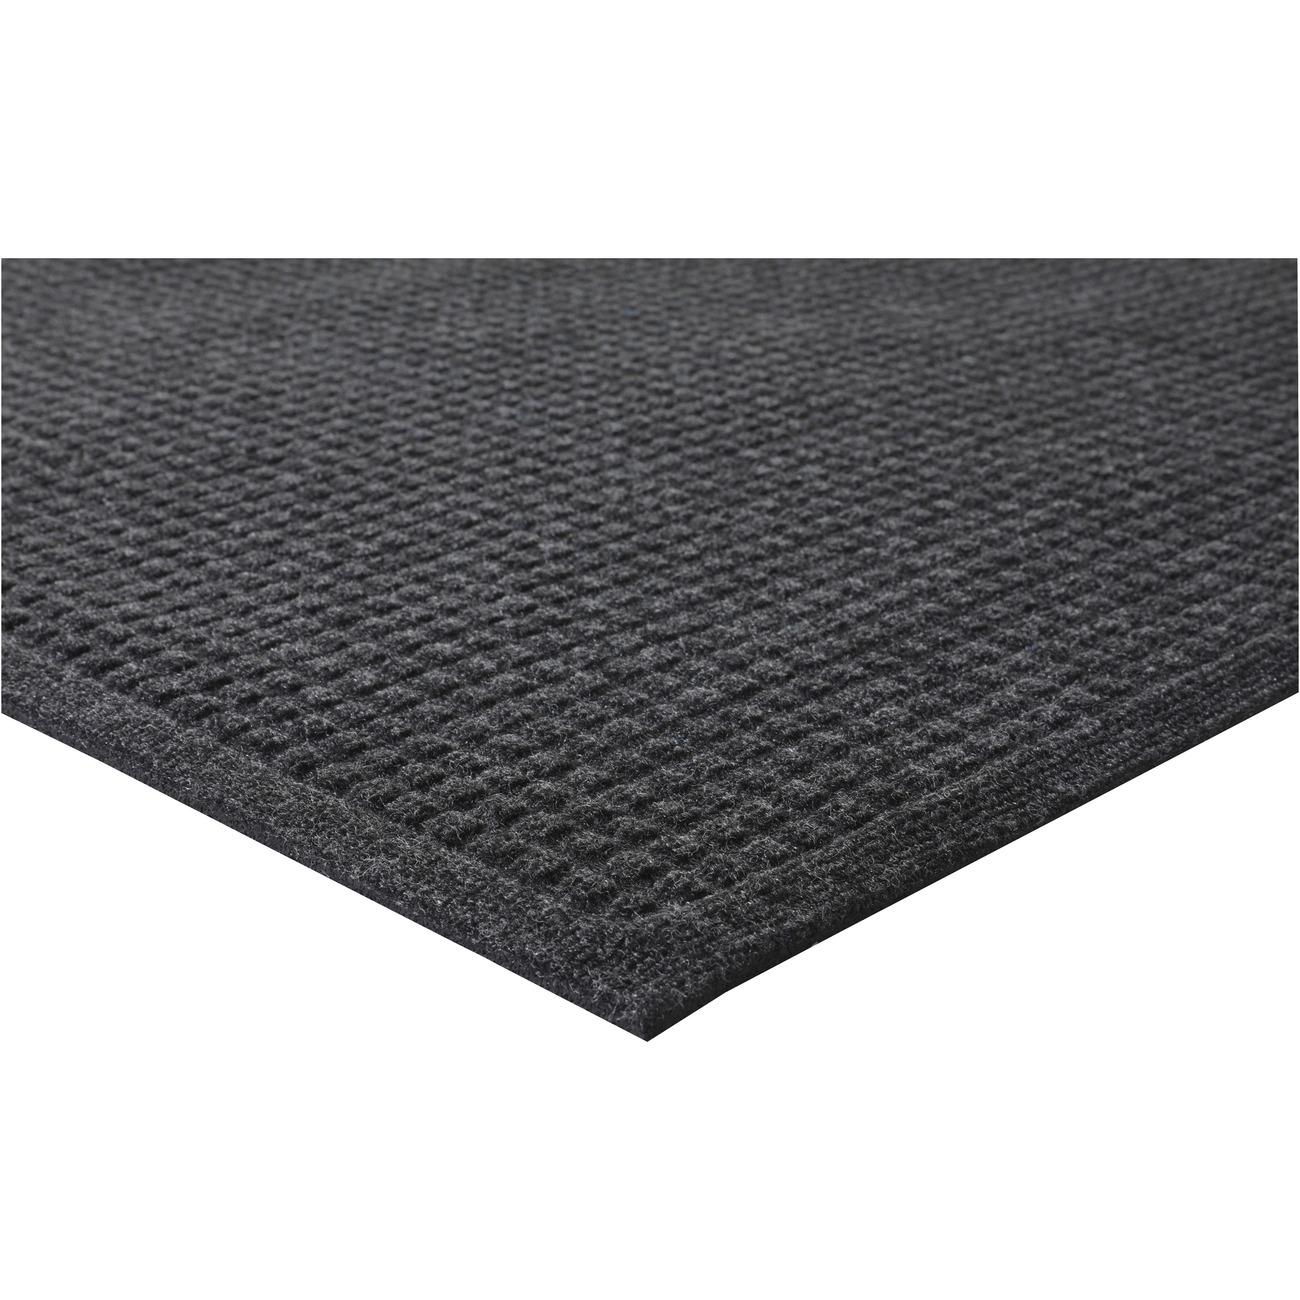 jigsaw tiles rubber of products black smai flooring gym floor mat copy mats